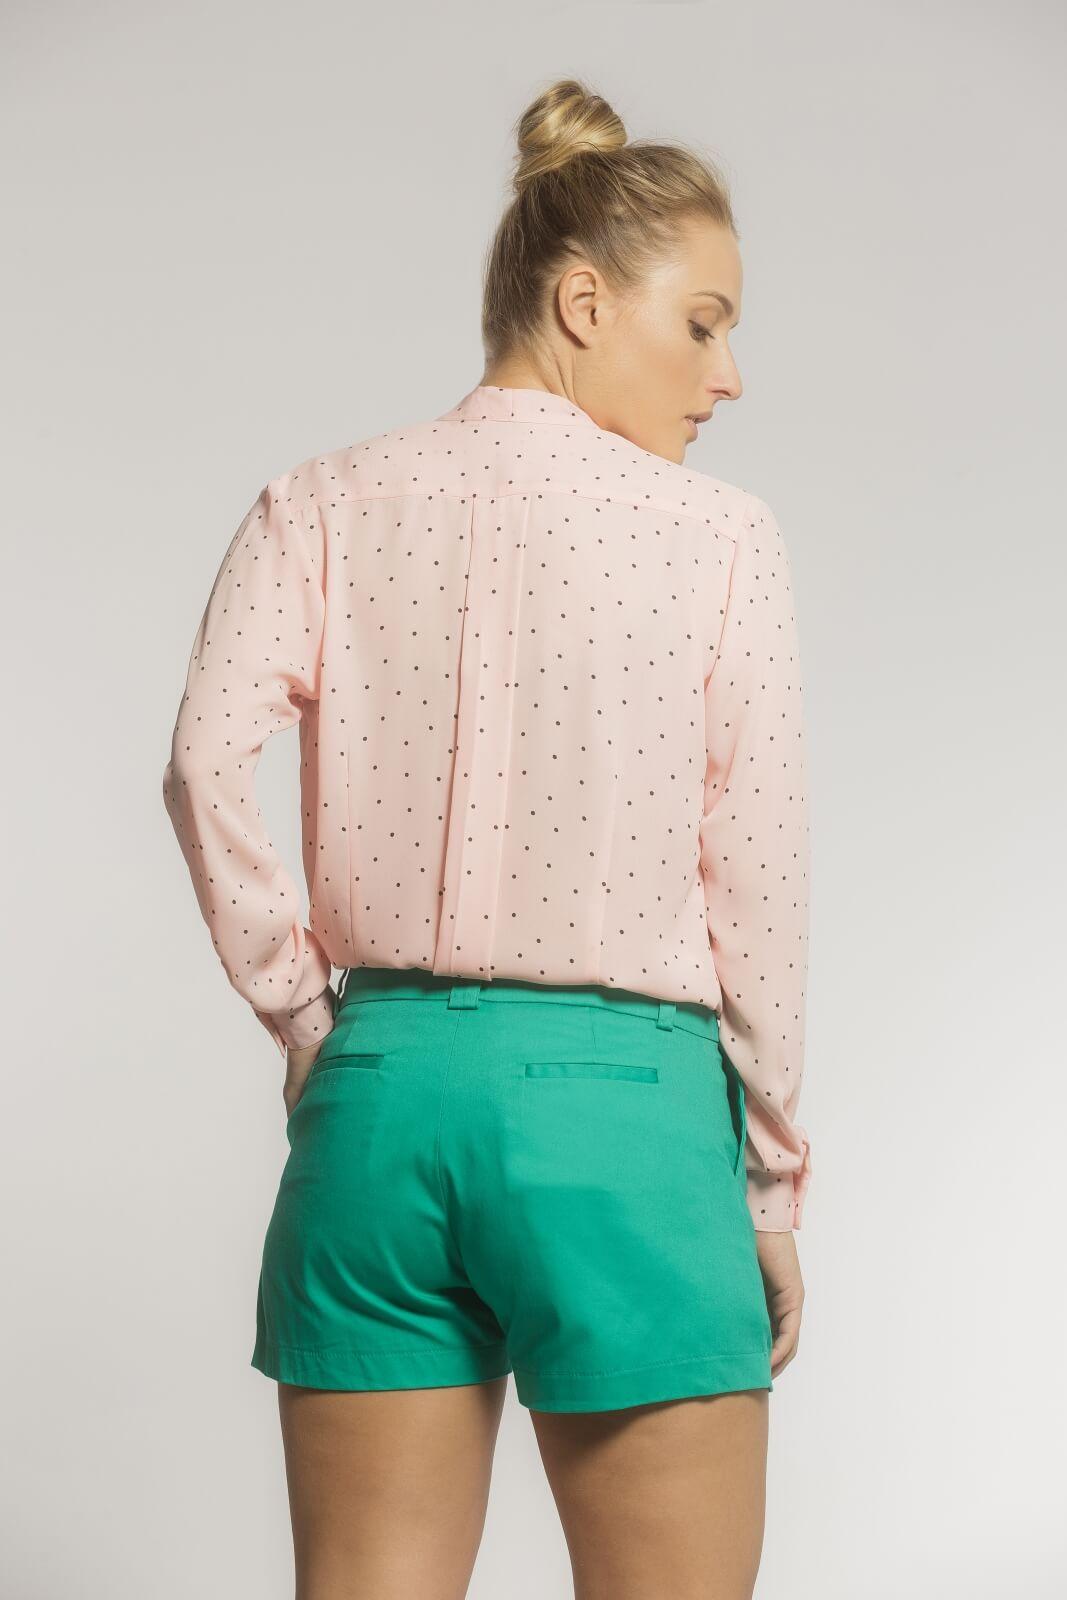 Camisa Feminina Gola Laço Crepe Poá Rosé